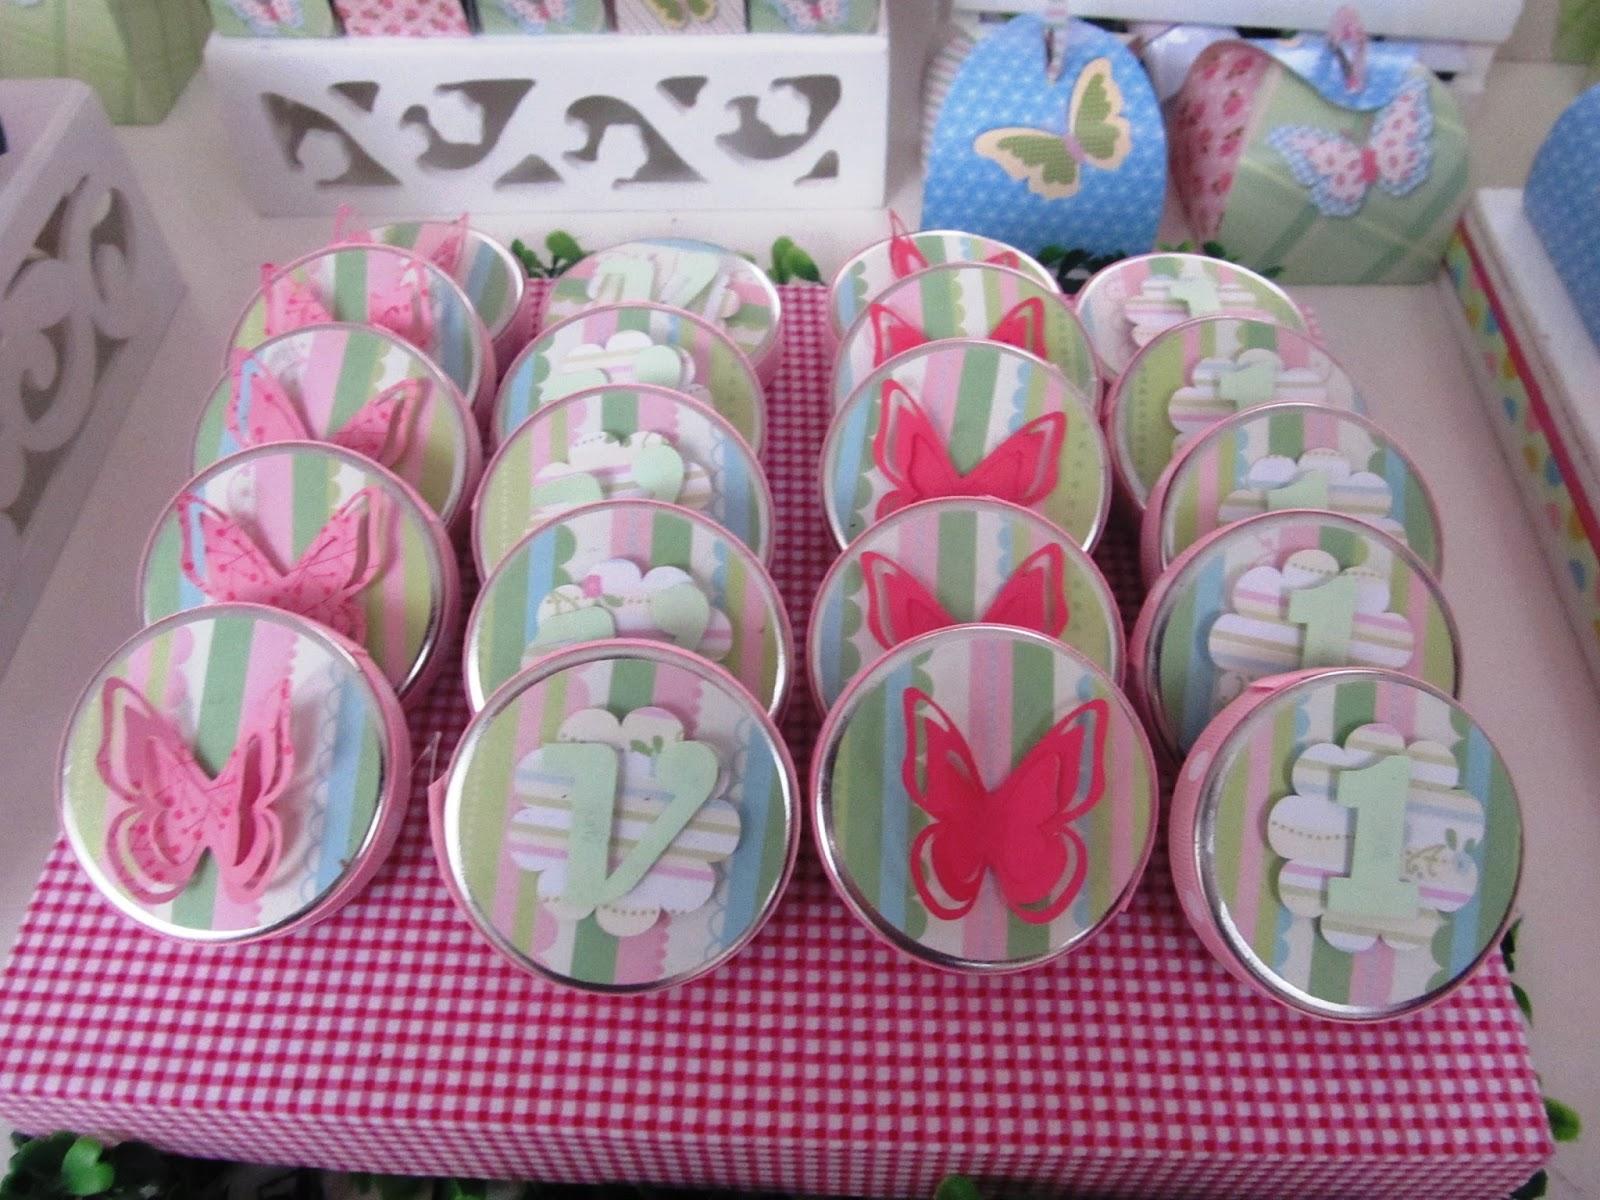 decoracao de aniversario jardim das borboletas:DECORAÇÃO PROVENÇAL : JARDIM DE BORBOLETAS